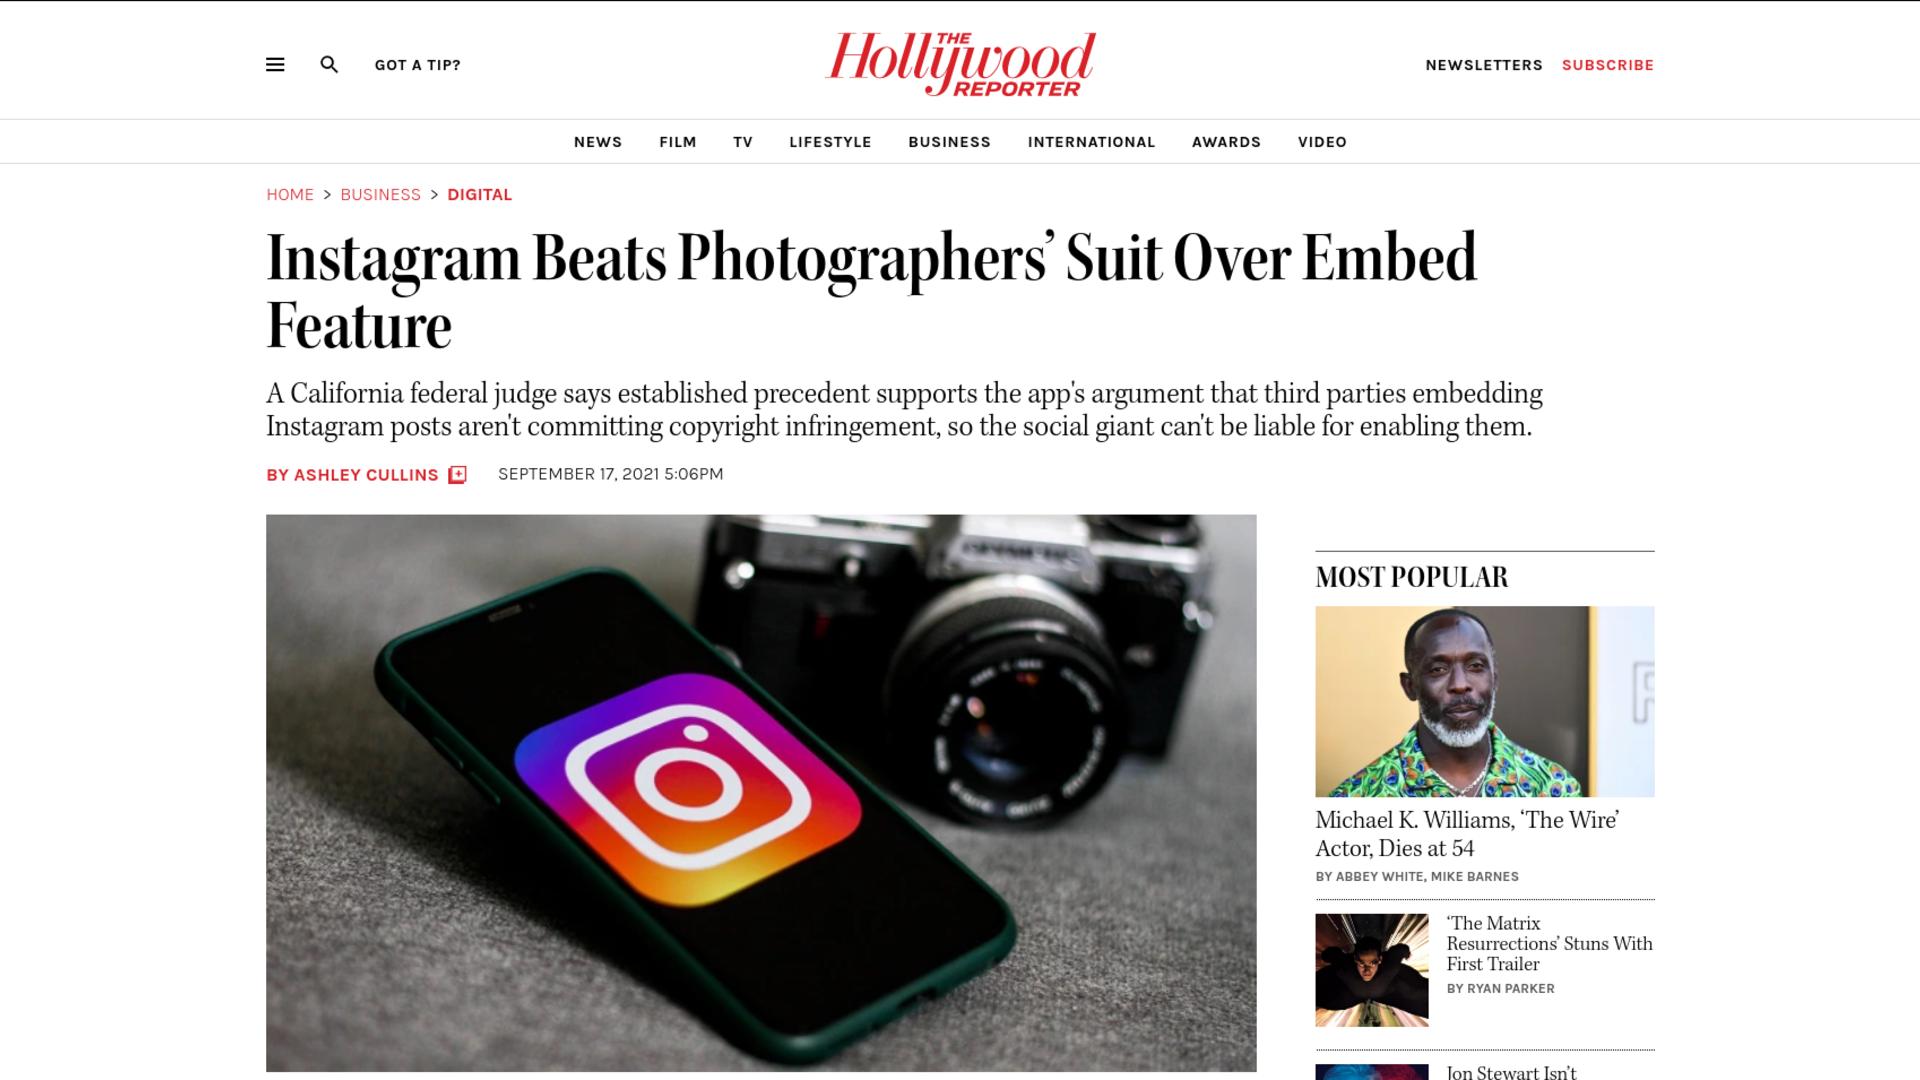 Fairness Rocks News Instagram Beats Photographers' Suit Over Embed Feature